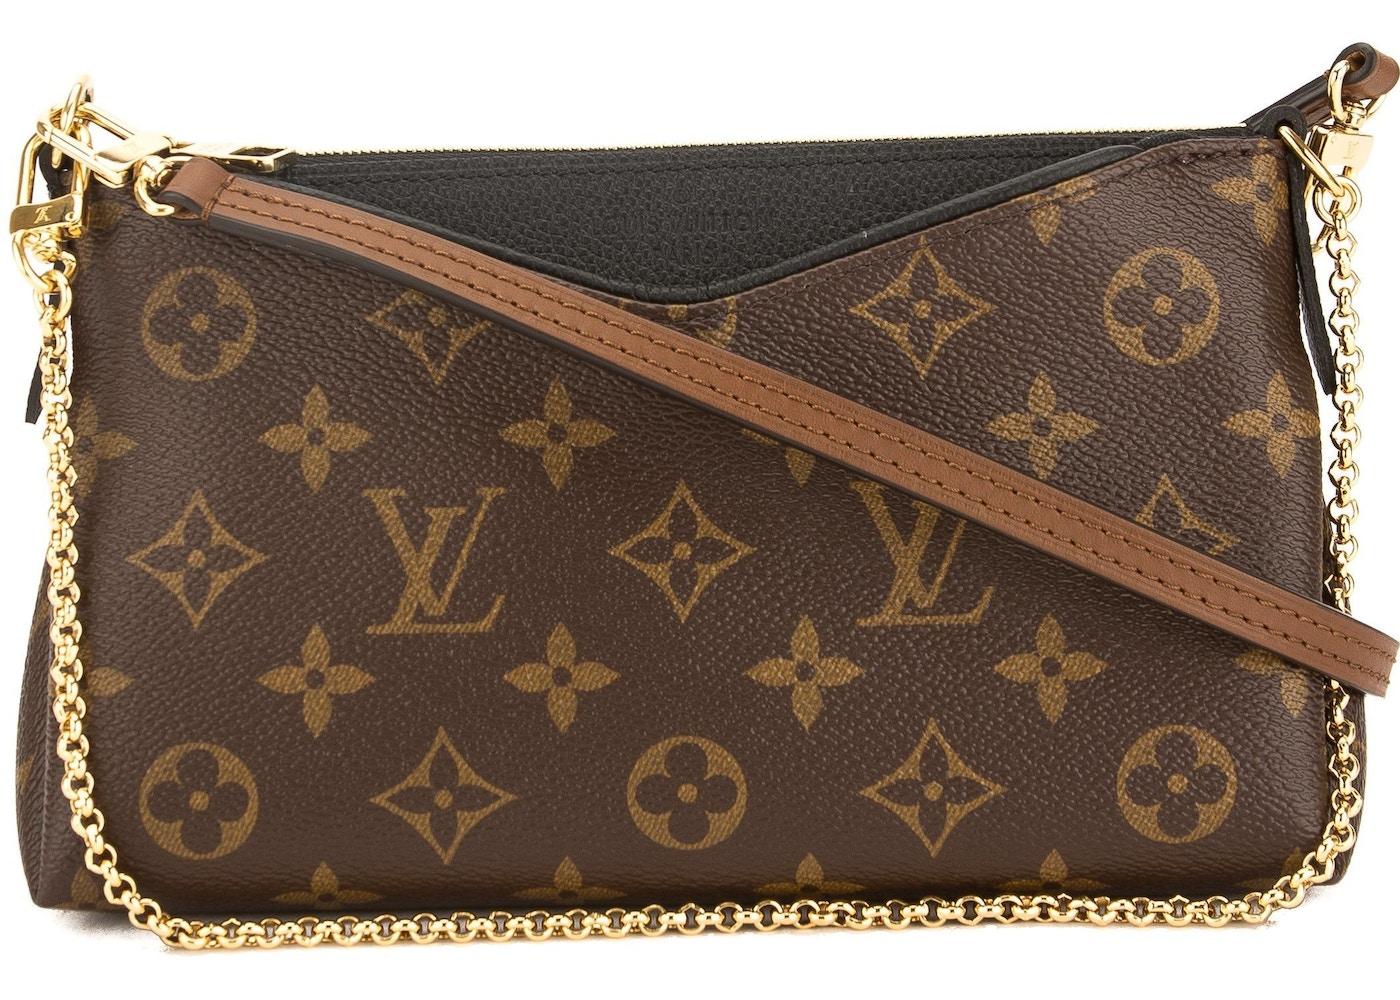 03f74df70d6c Louis Vuitton Clutch Pallas Monogram Black Brown